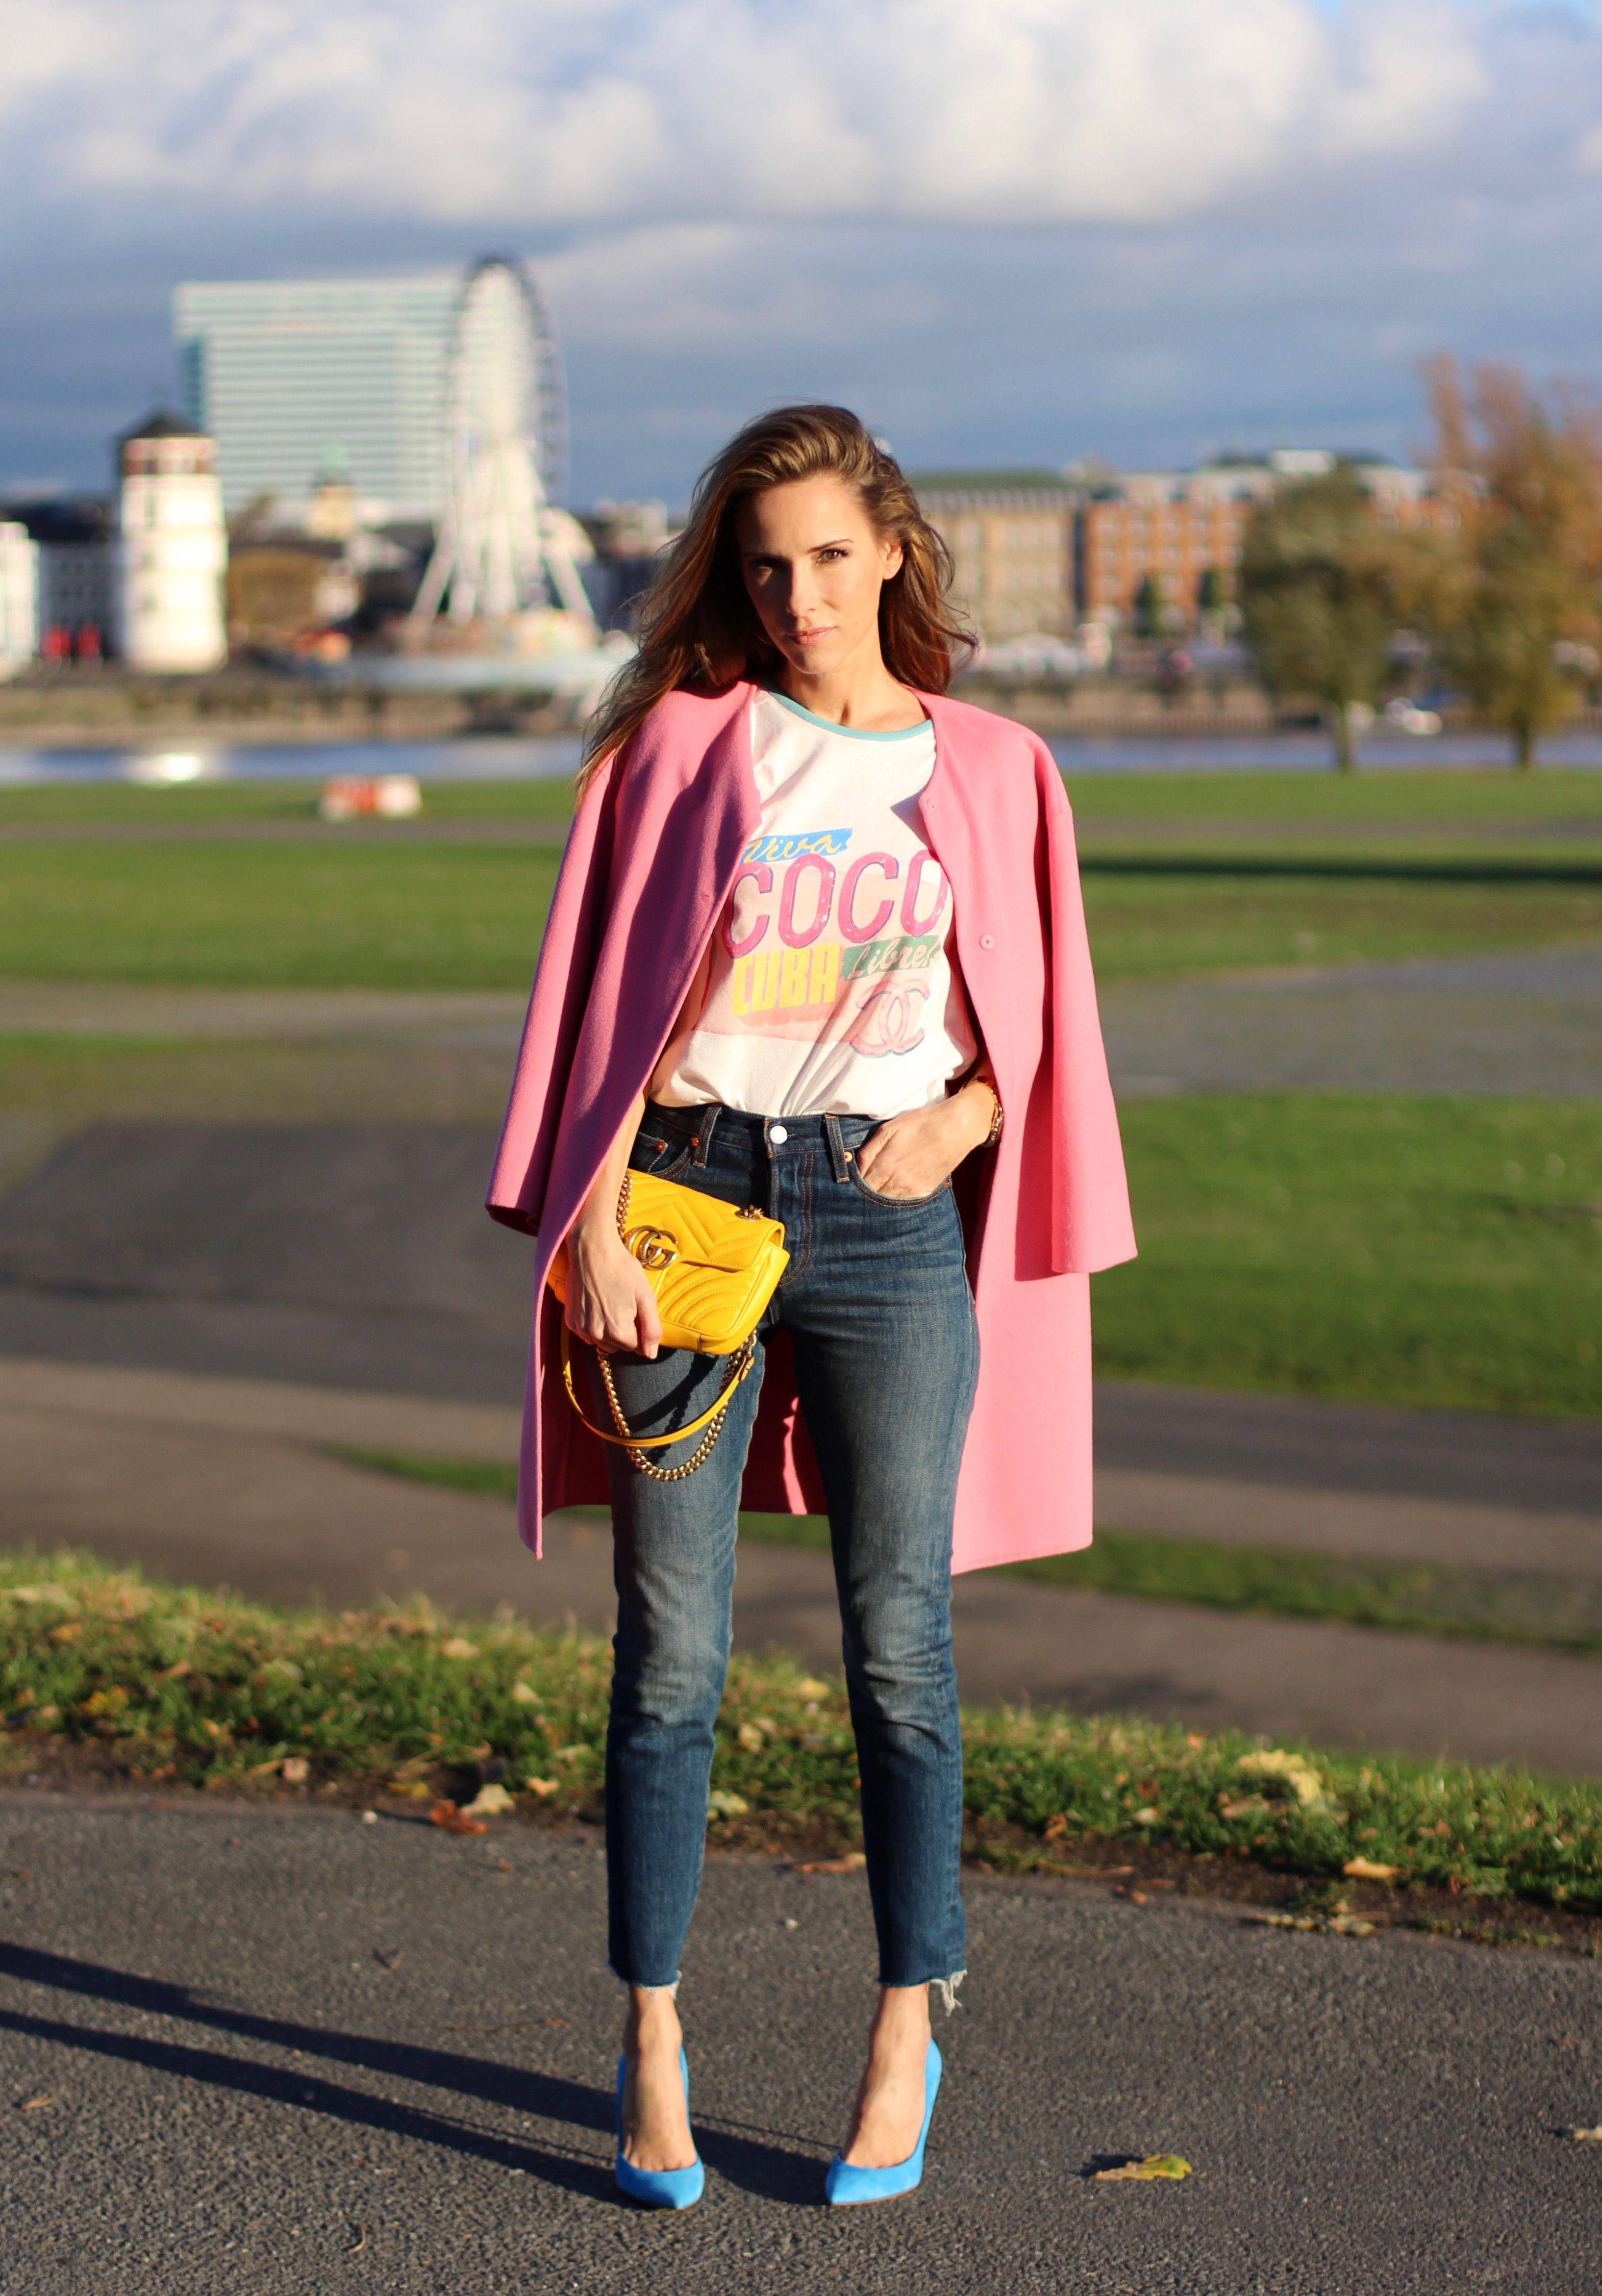 cbe5cca1 DÜSSELDORF; GERMANY - DEZEMBER : German model and fashion blogger Alexandra  Lapp (@alexandralapp_) wearing a Coco Cuba T-shirt from Chanel, high waist  denim ...